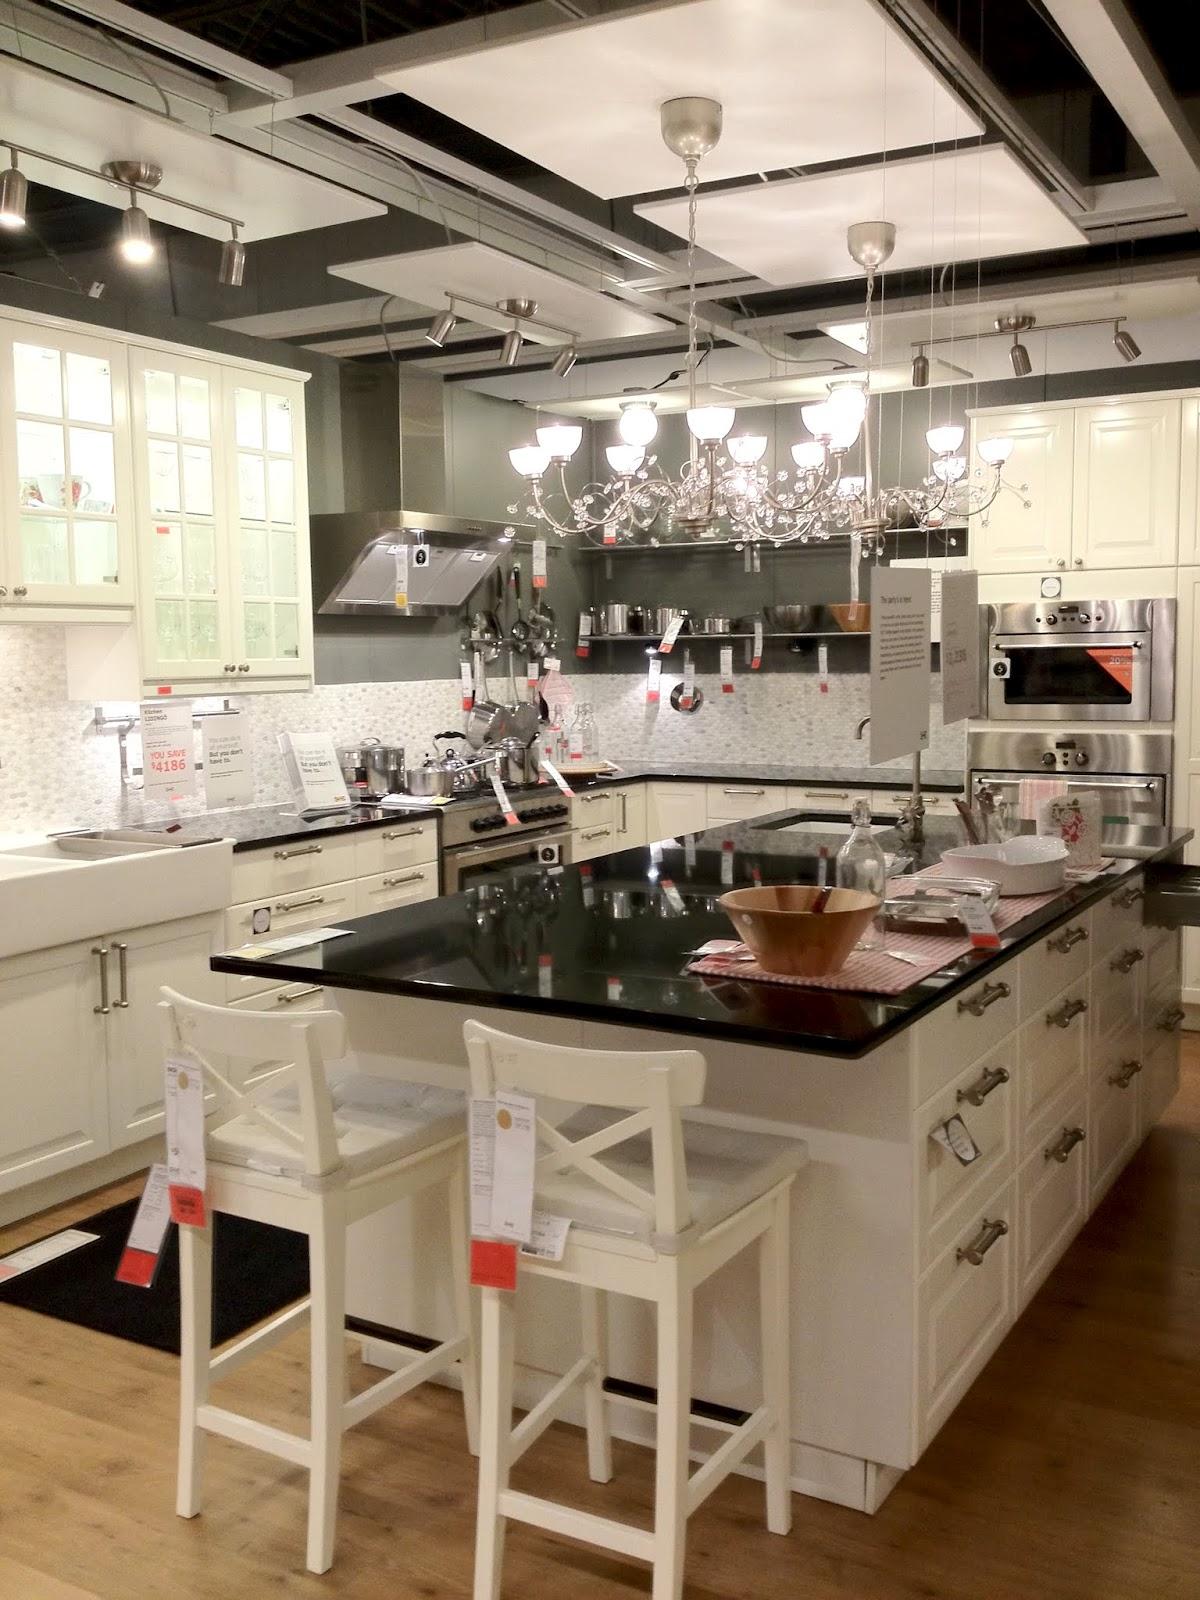 Kitchen Showrooms Ikea Ikea Kitchen Tour  Creative Cain Cabin